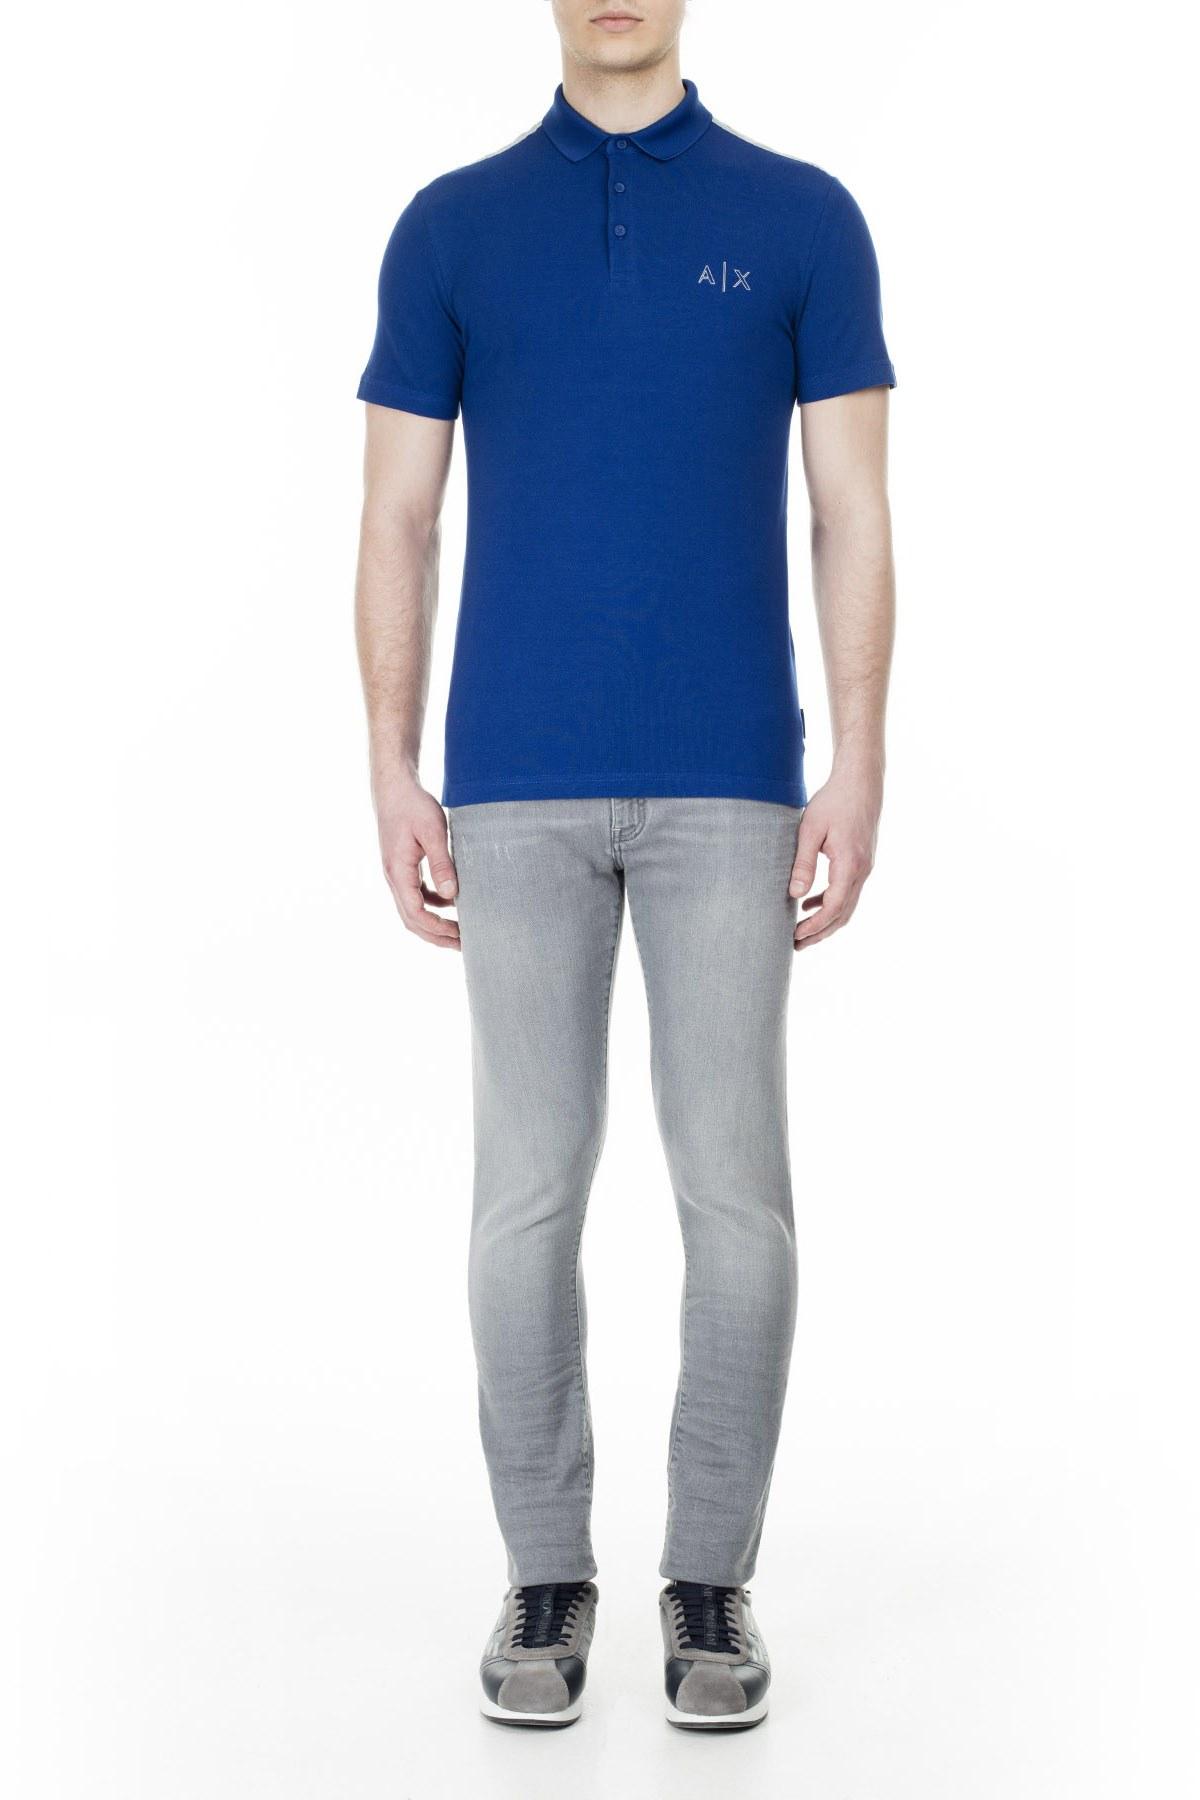 Armani Exchange T Shirt Erkek Polo 3HZFAF ZJ3NZ 1511 SAKS